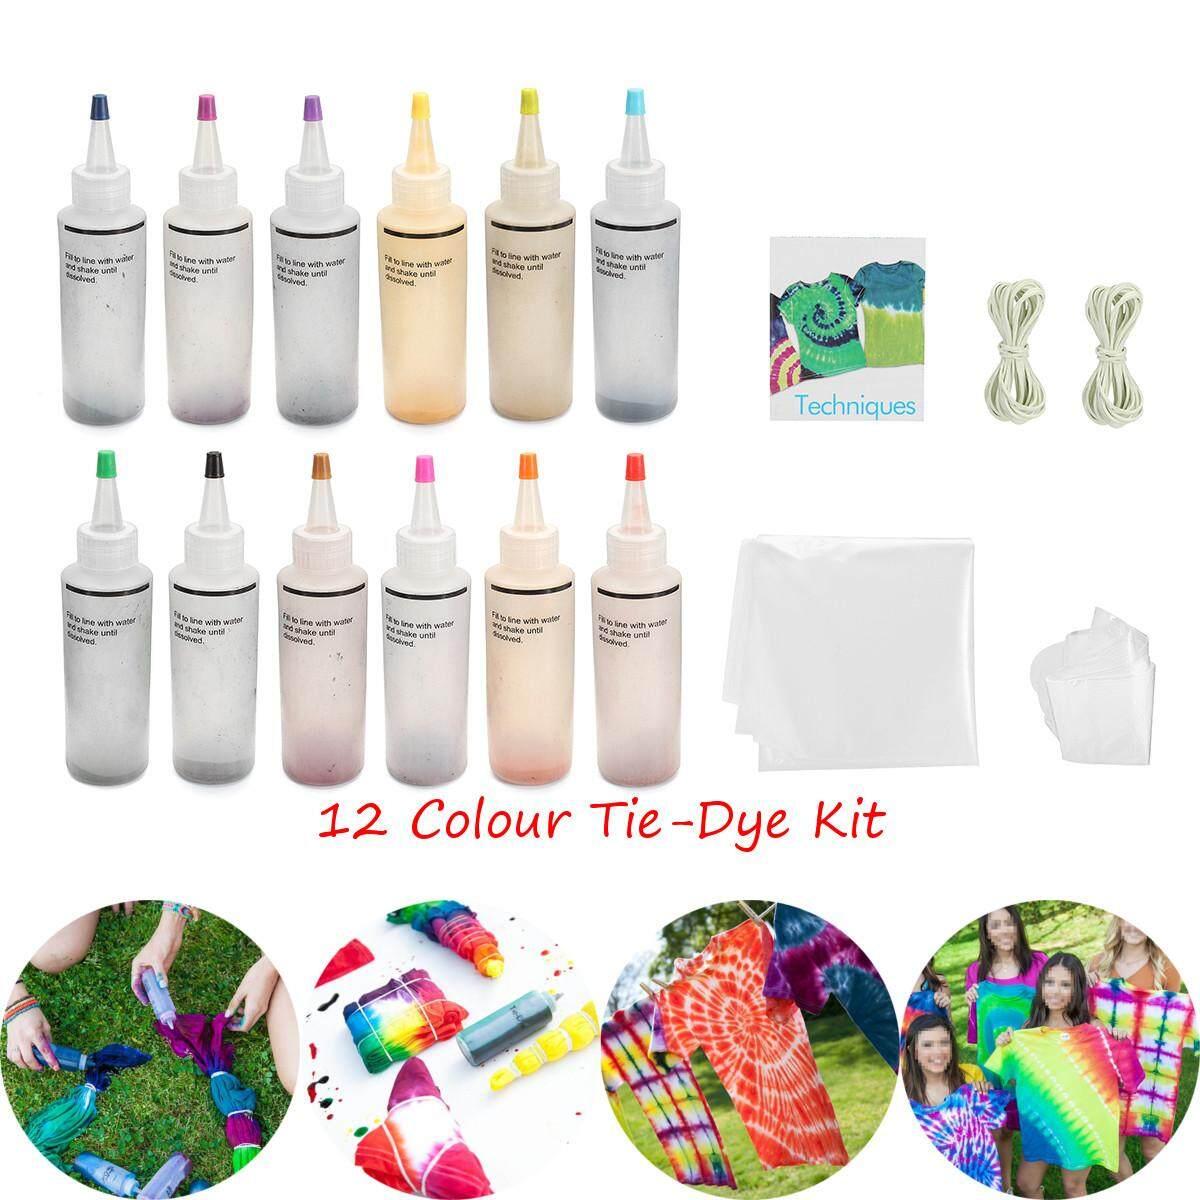 Tulip Satu Langkah 12 Warna Tie-Dye Kit Super Besar By Qiaosha.